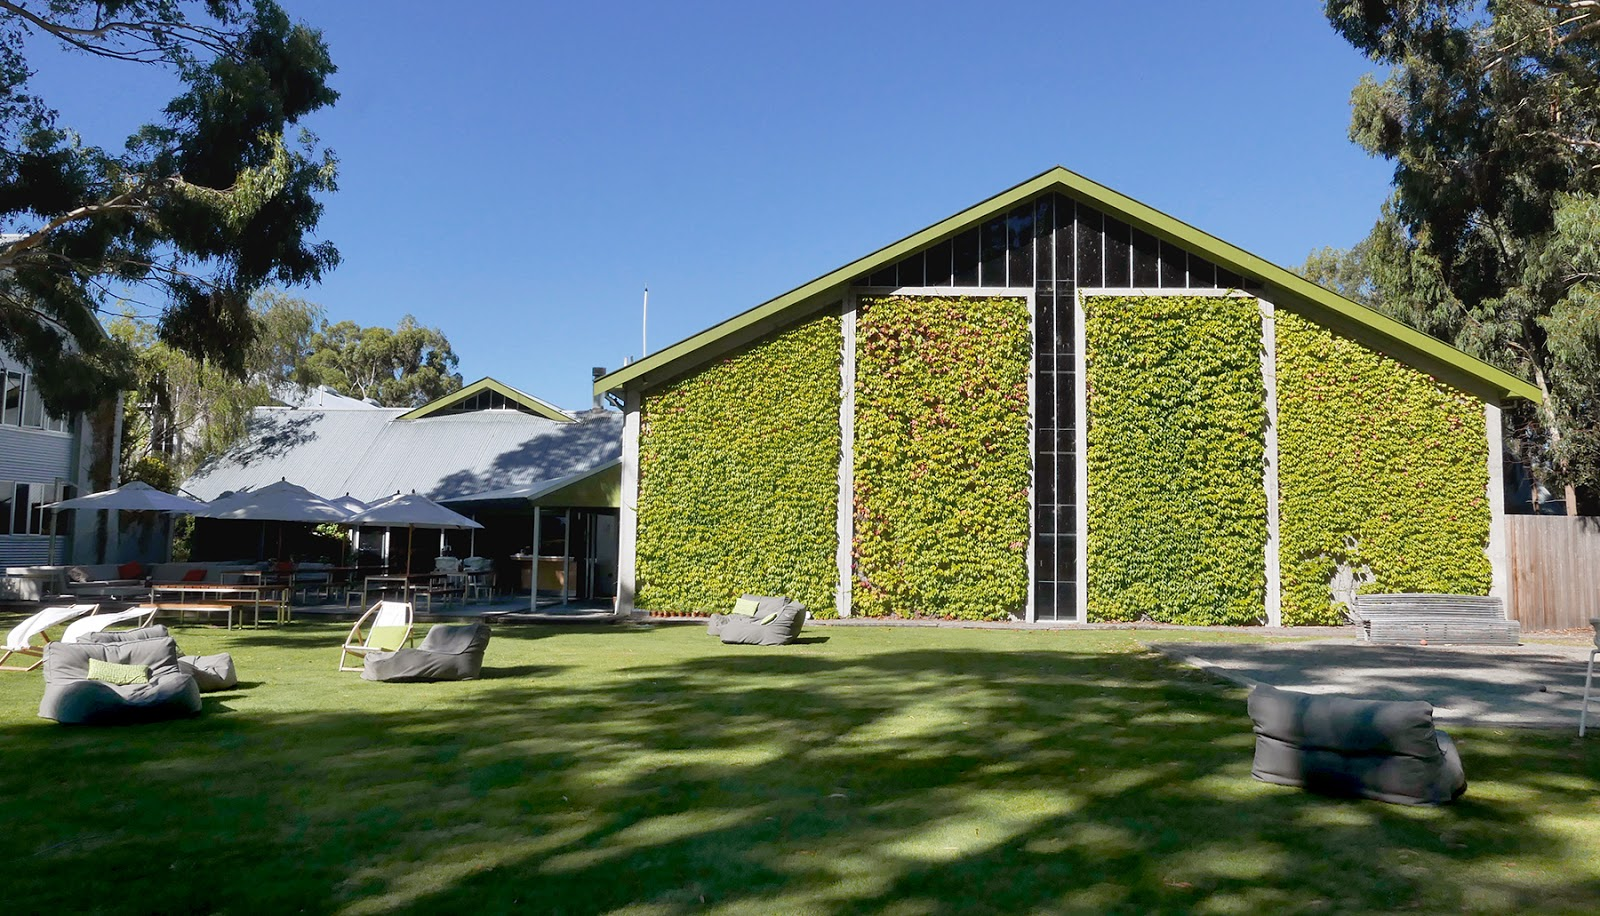 Euriental   luxury travel & style   Cloudy Bay Winery, Marlborough, New Zealand